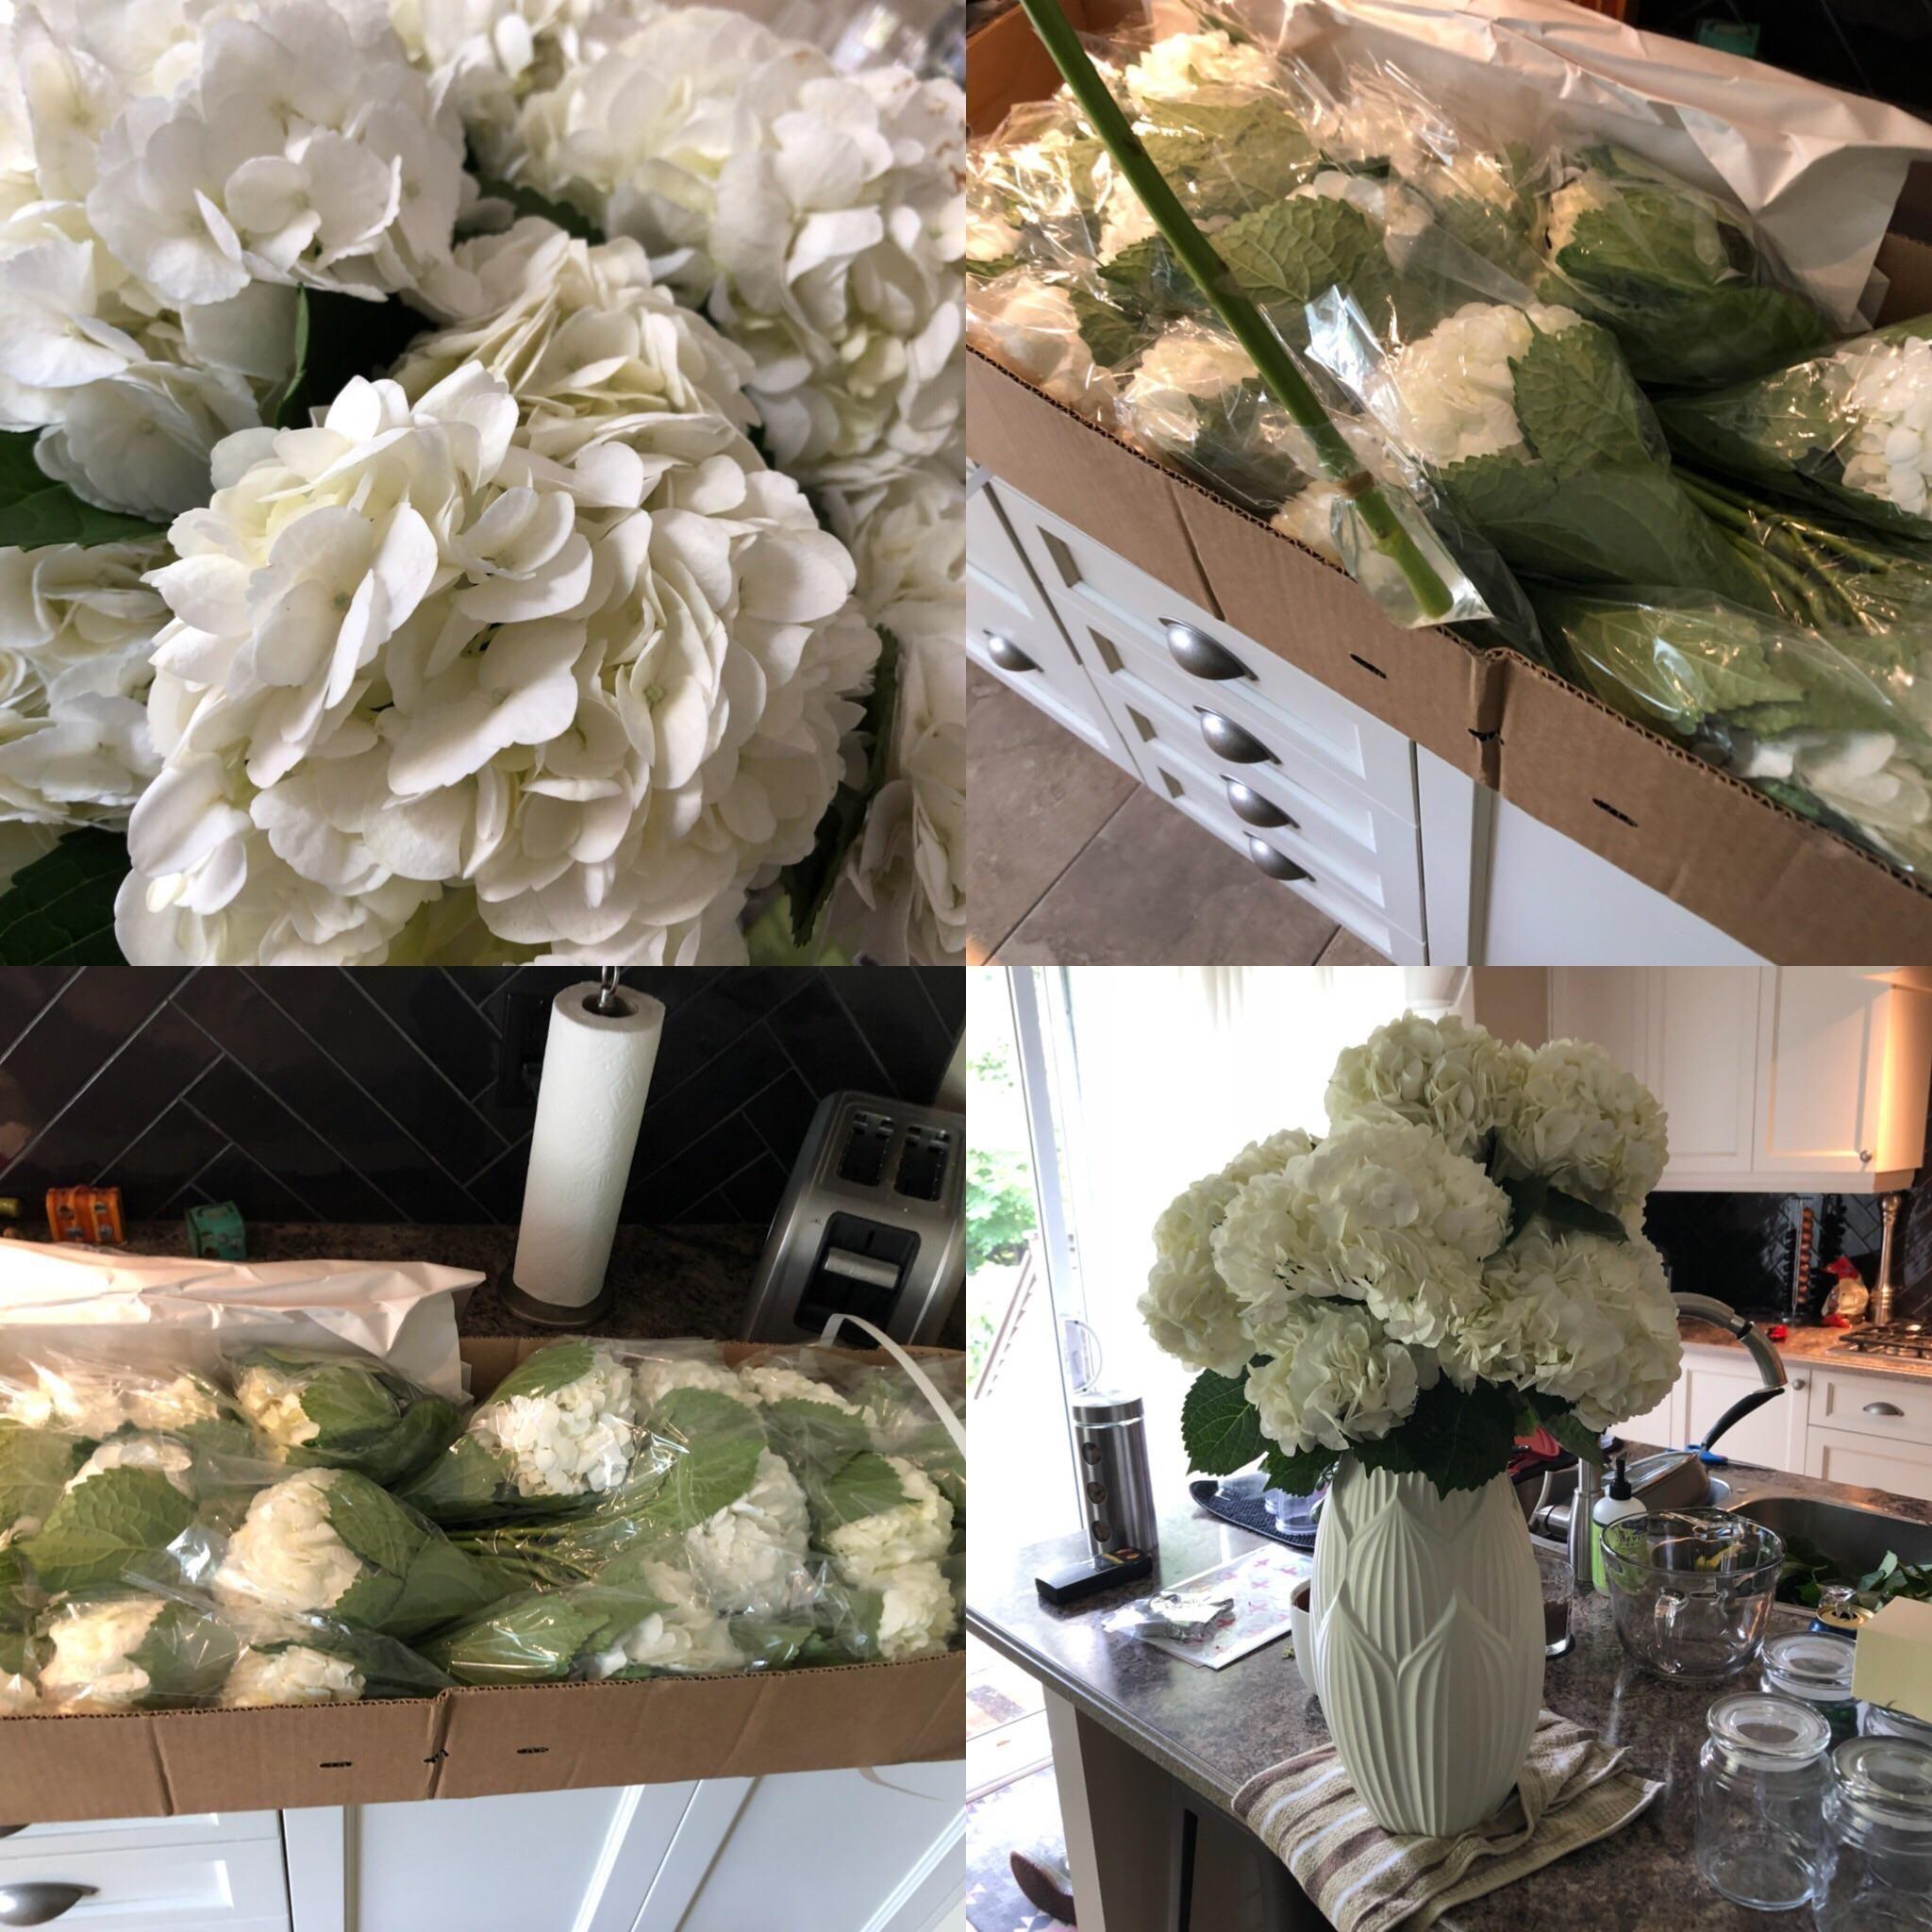 Wholesale Wedding Flowers Costco Receptions Costco Bulk Flowers Review Weddingplanning Bulk In 2020 Costco Wedding Flowers Wholesale Flowers Wedding Costco Flowers